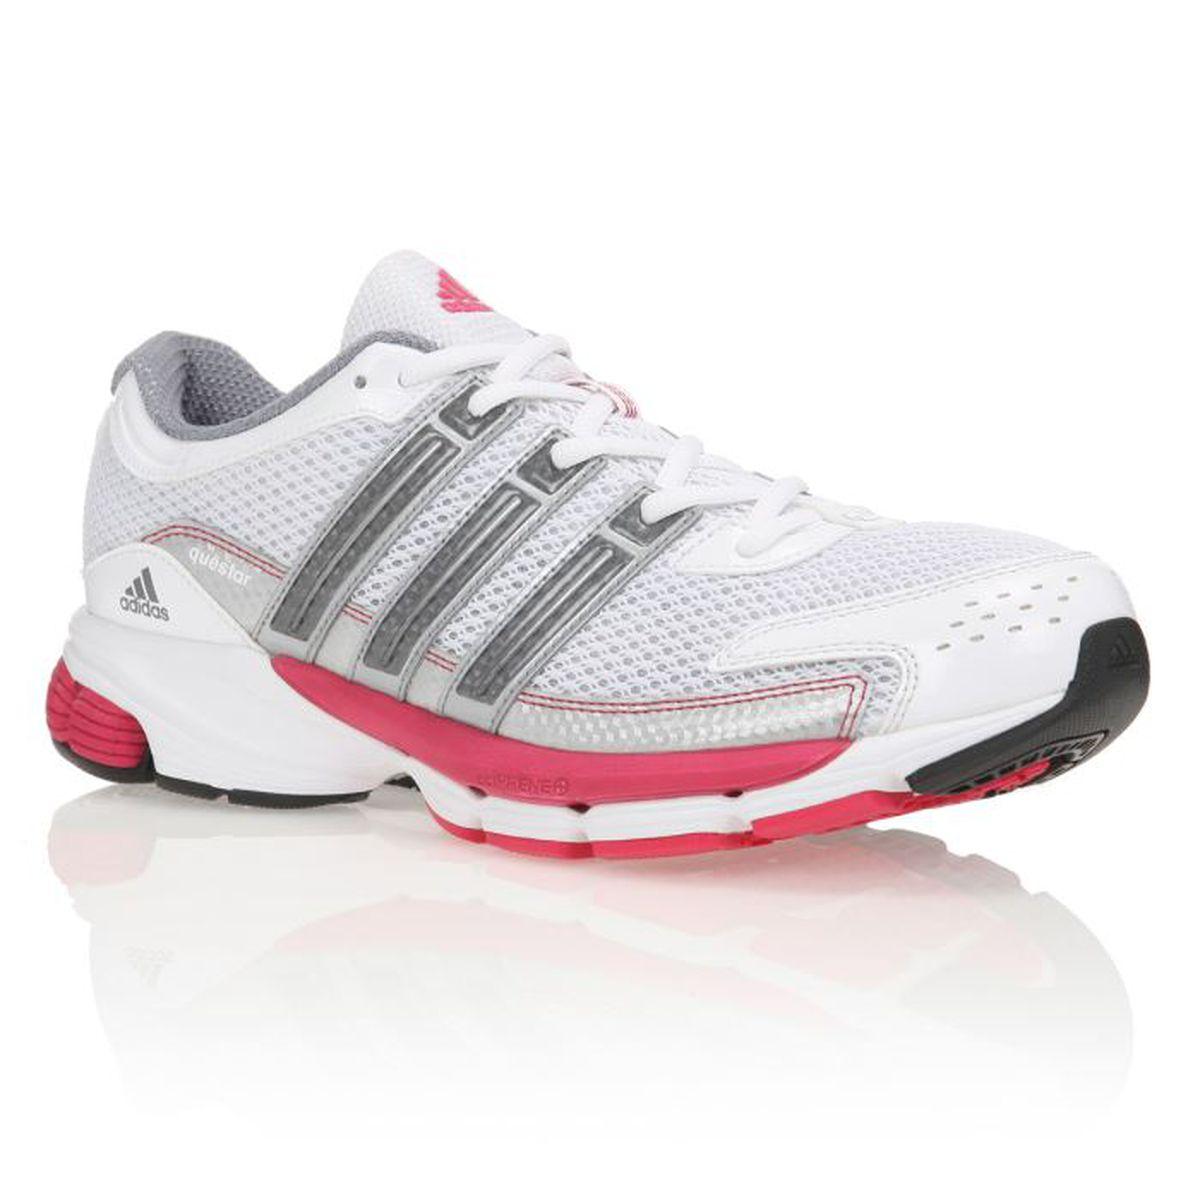 ADIDAS Chaussures de running Questar Cushion Femme Prix